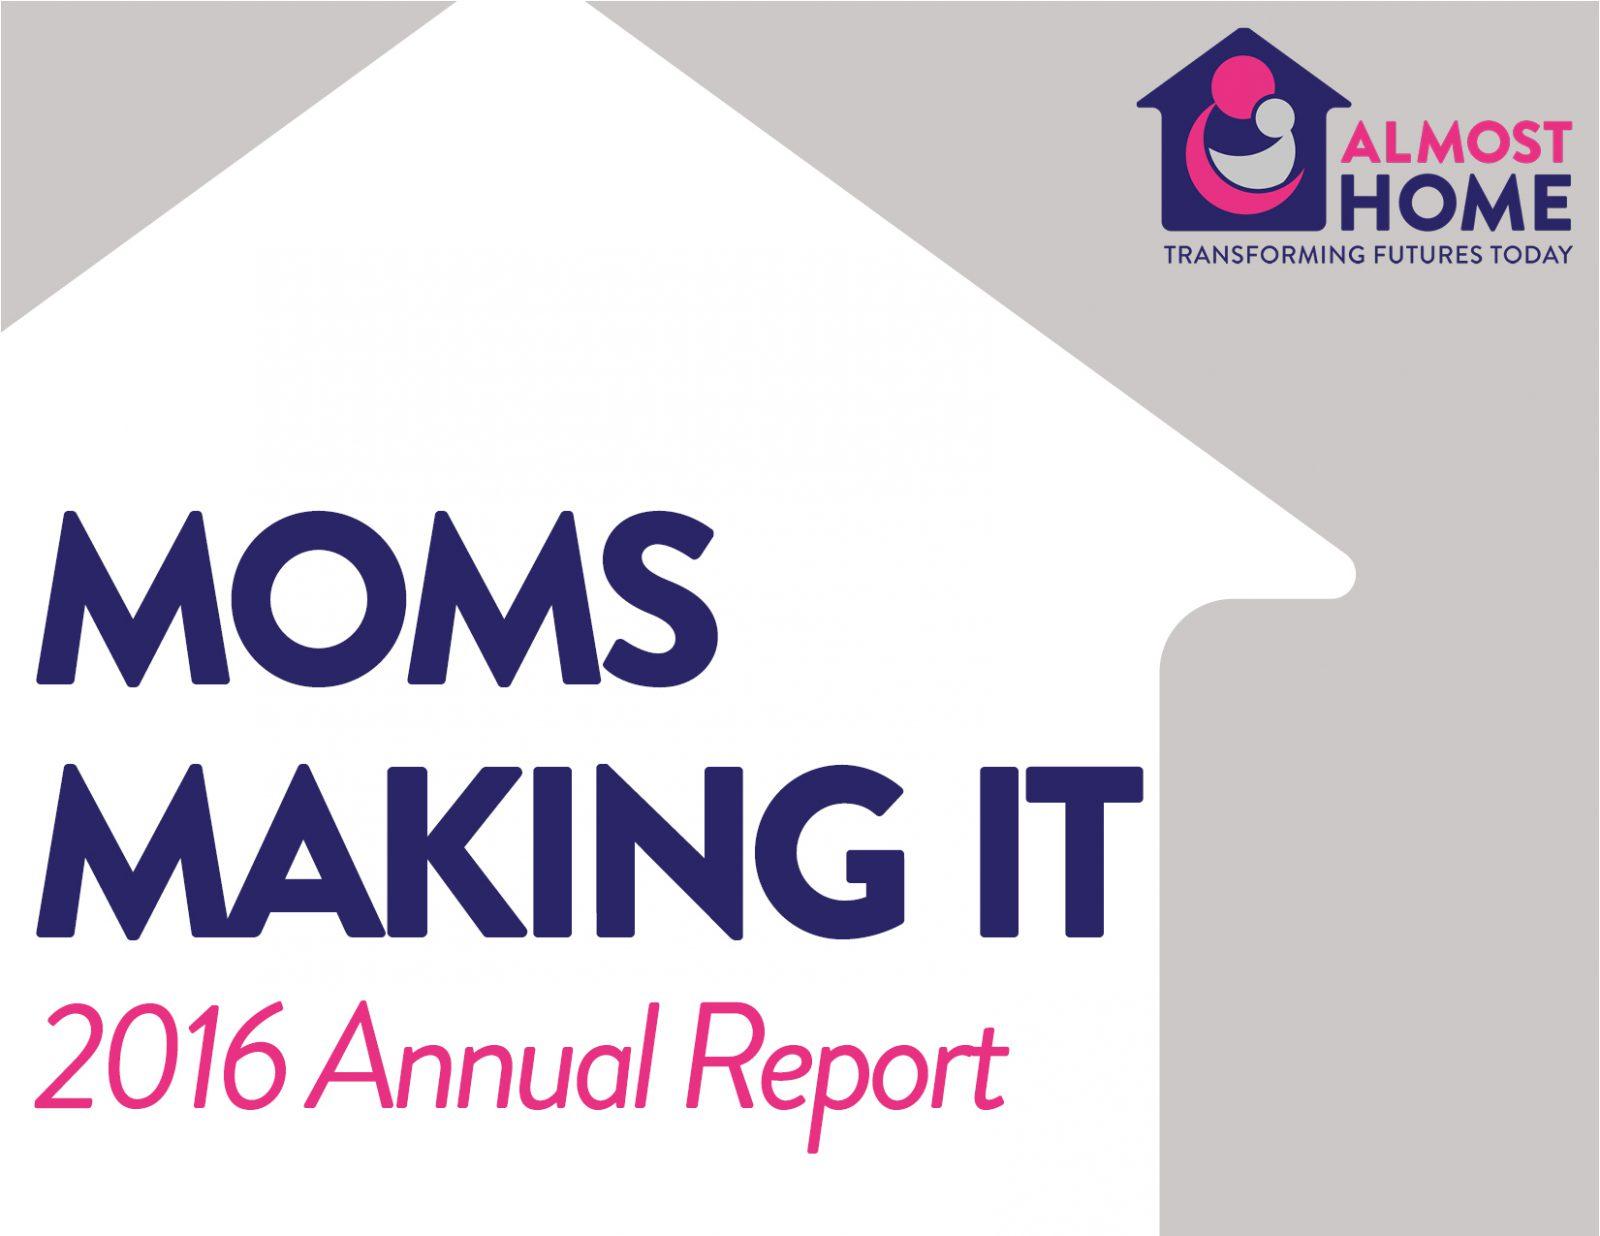 2016 Annual Report Cover Photo